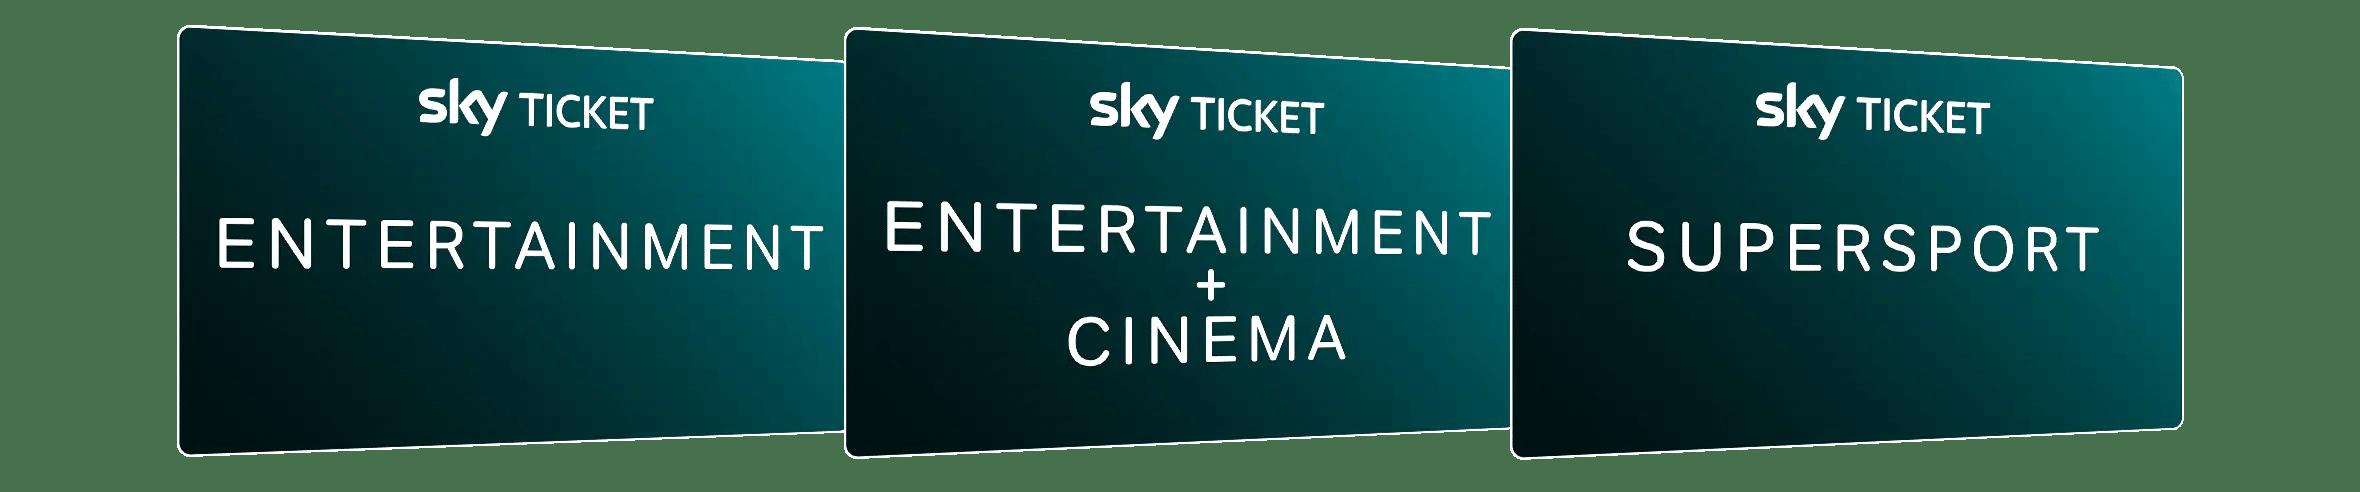 sky-ticket-alle-tickets